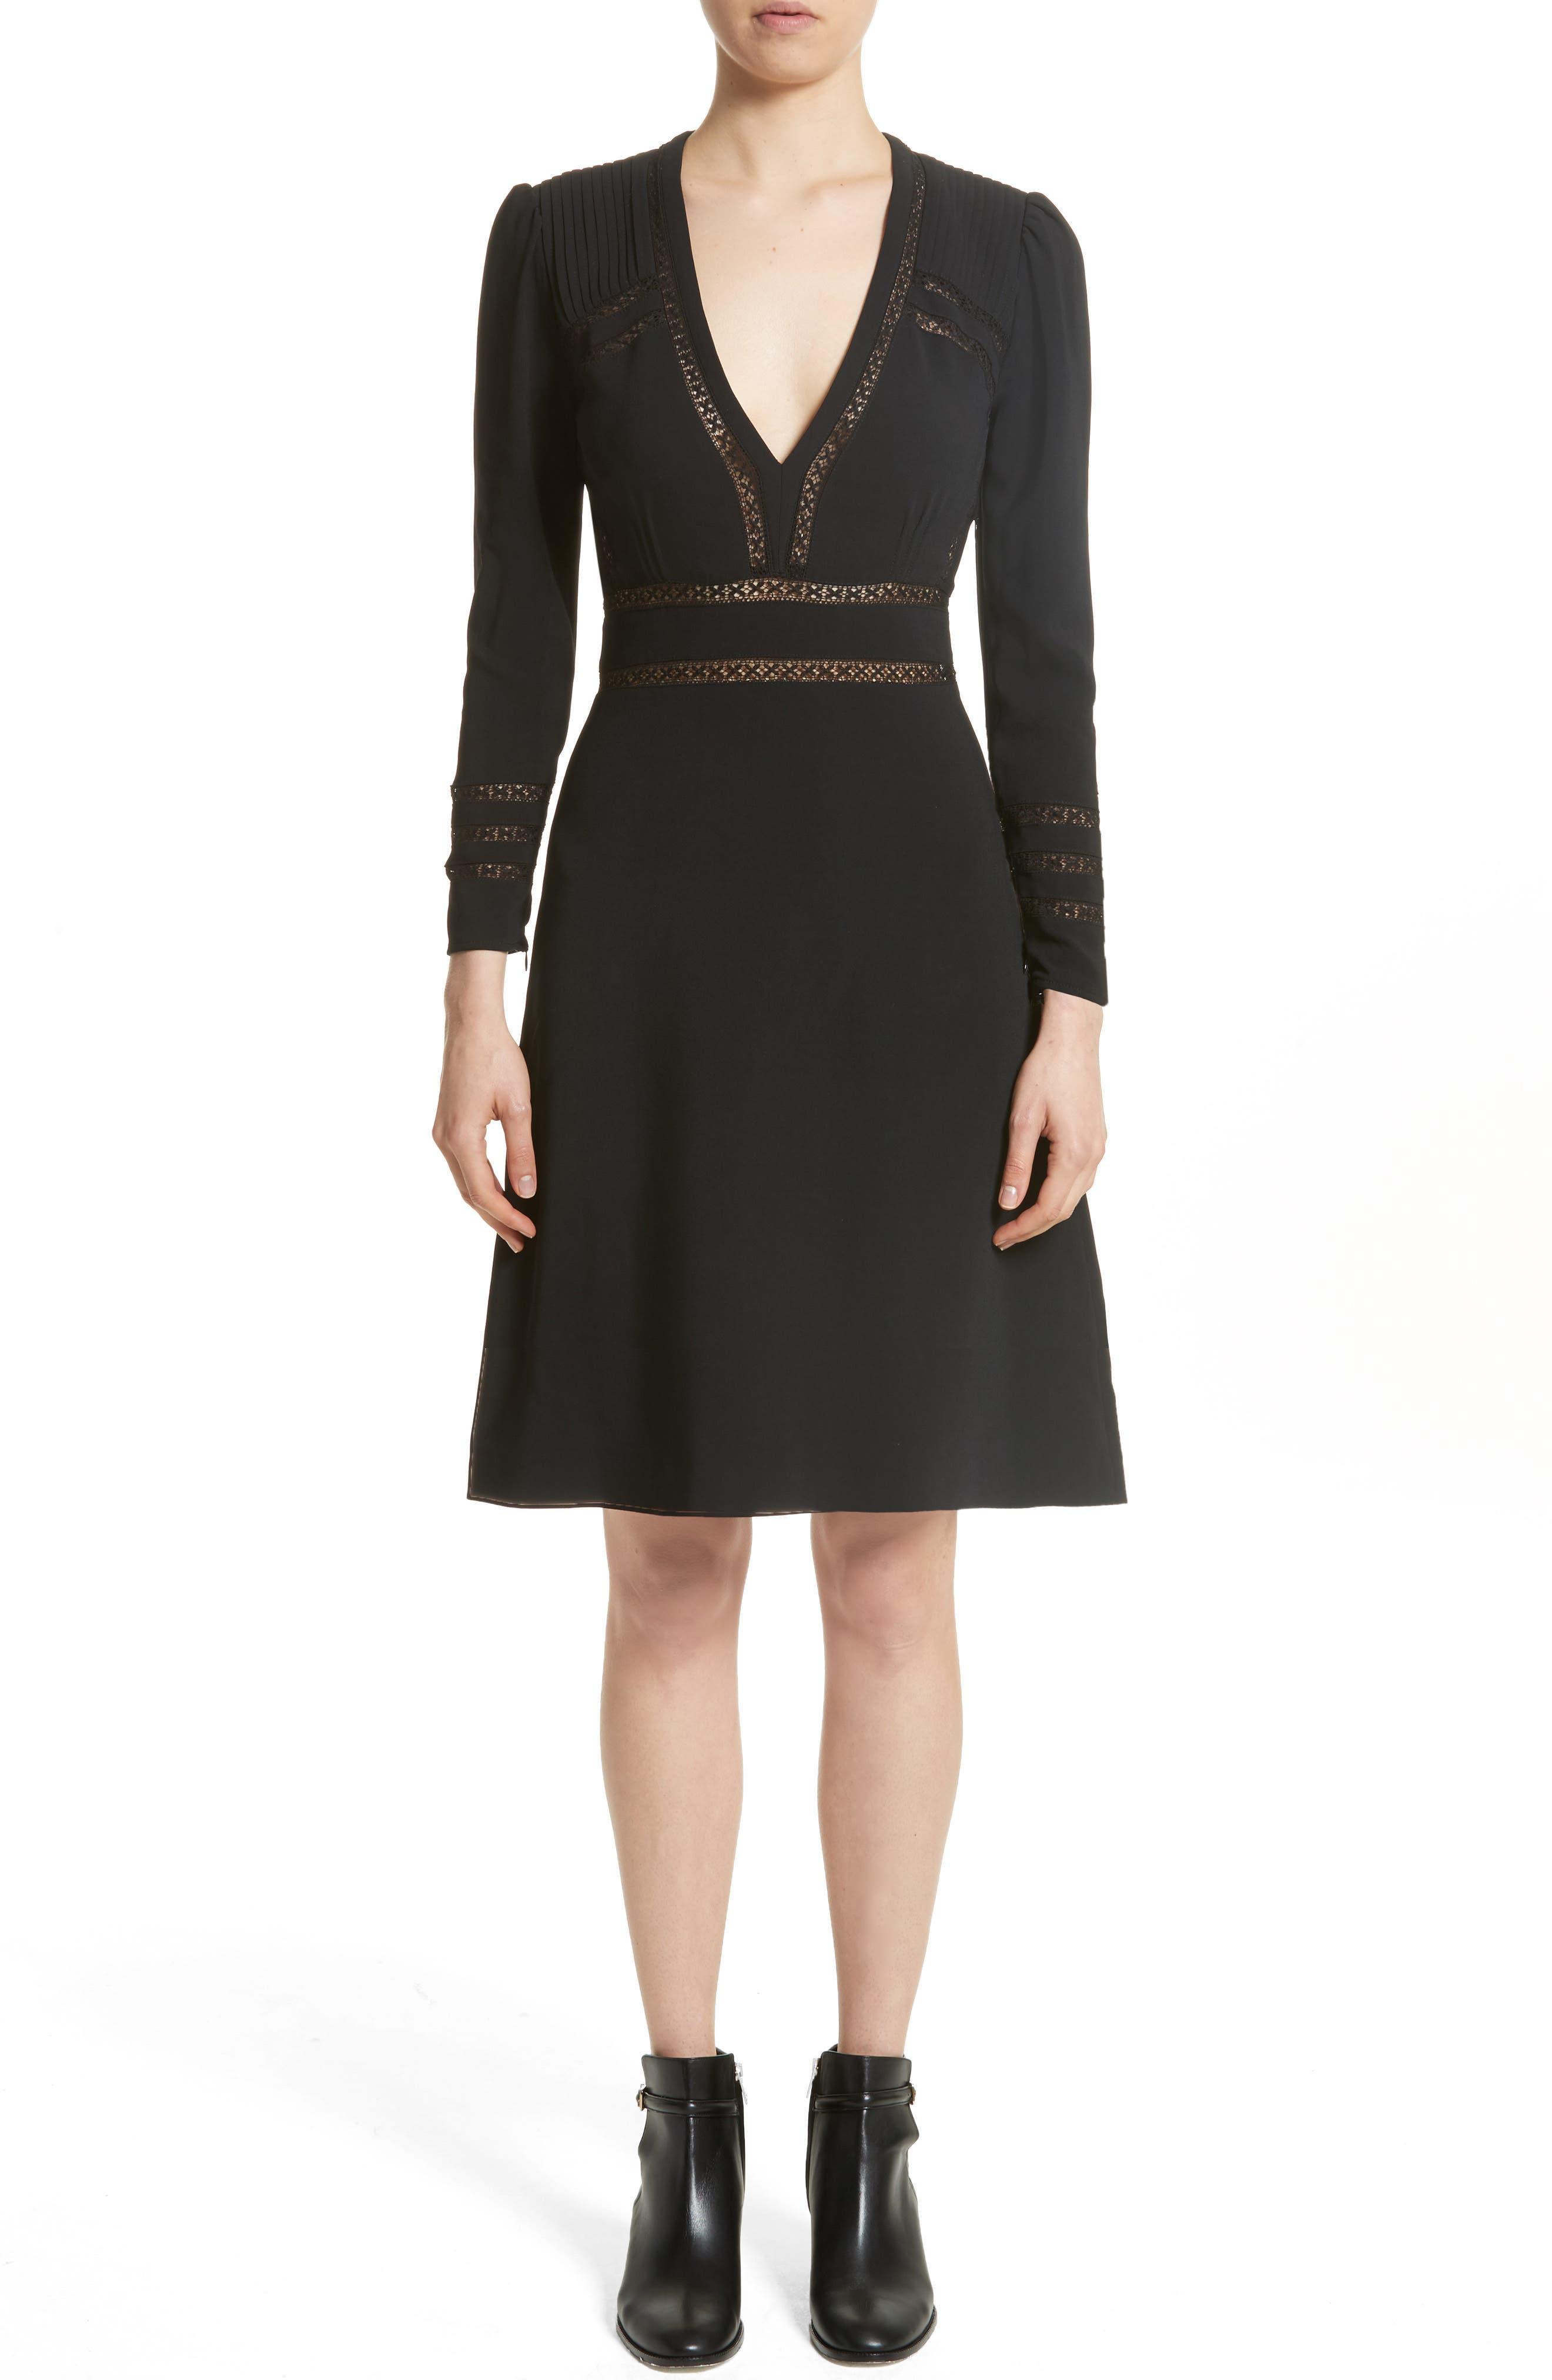 Burberry Fran Dress